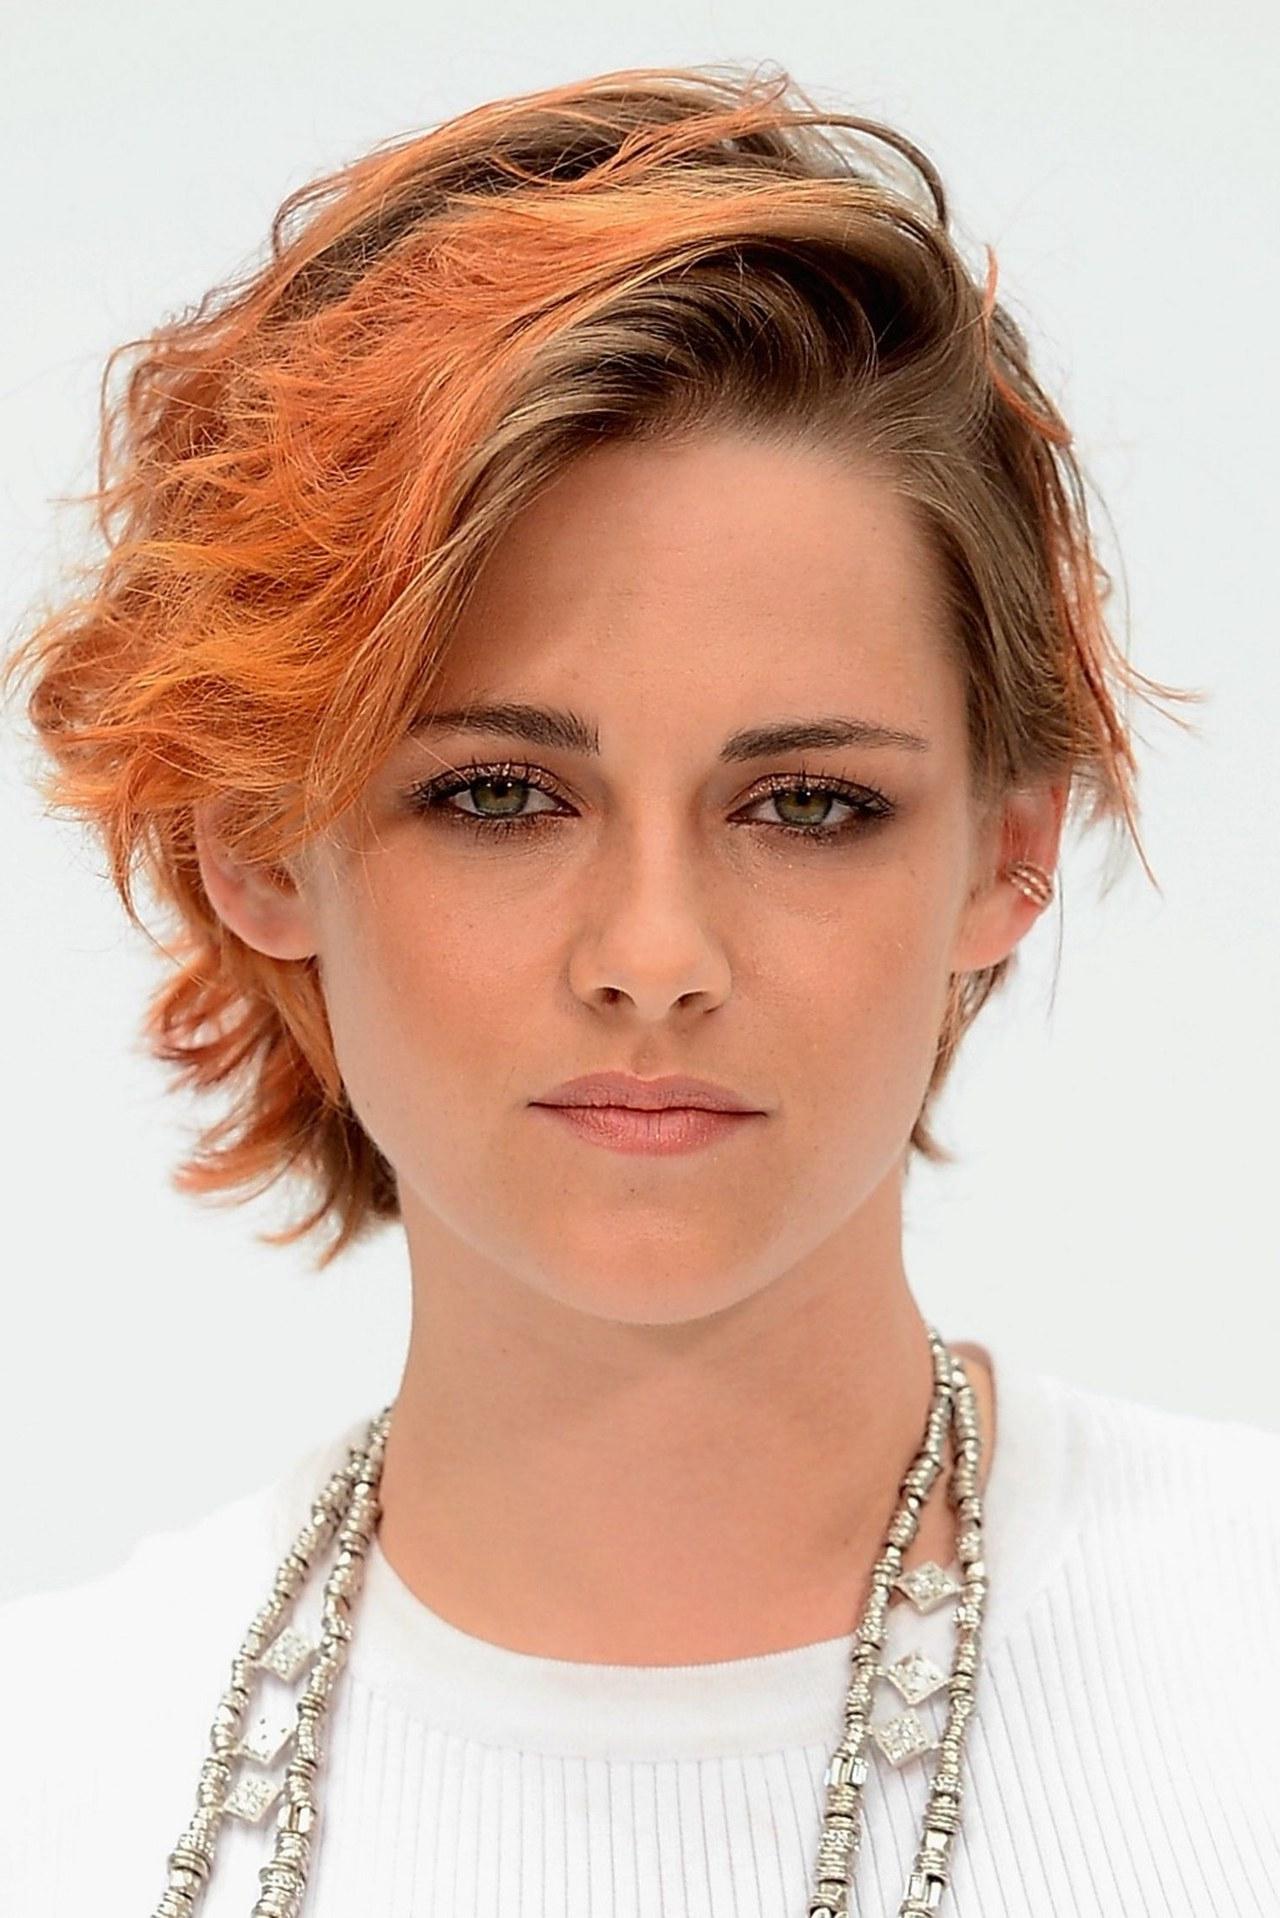 Kristen Stewart Cut Her Hair: See Her New Short Haircut From The Inside Kristen Stewart Short Hairstyles (View 9 of 25)